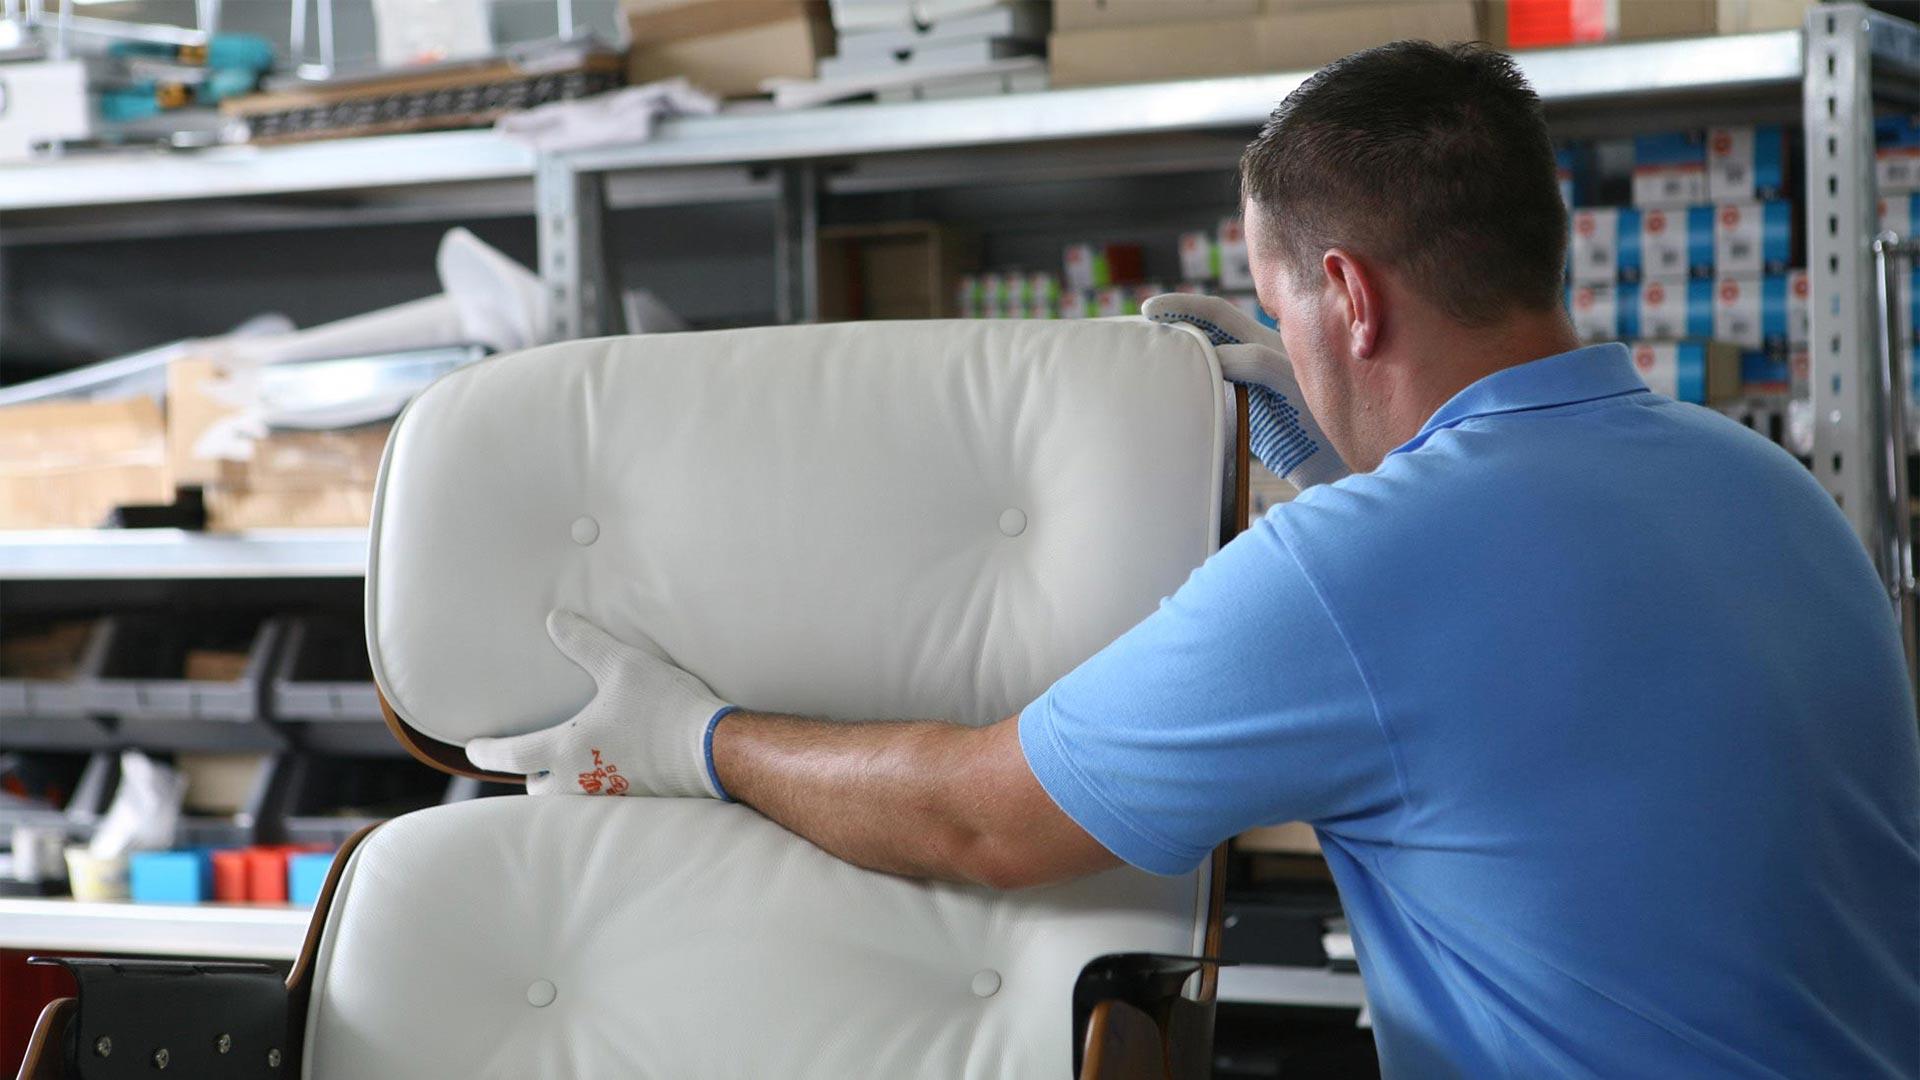 Reparatur Vitra Eames Lounge Chair Ersatzteile in Berlin bei steiden+06